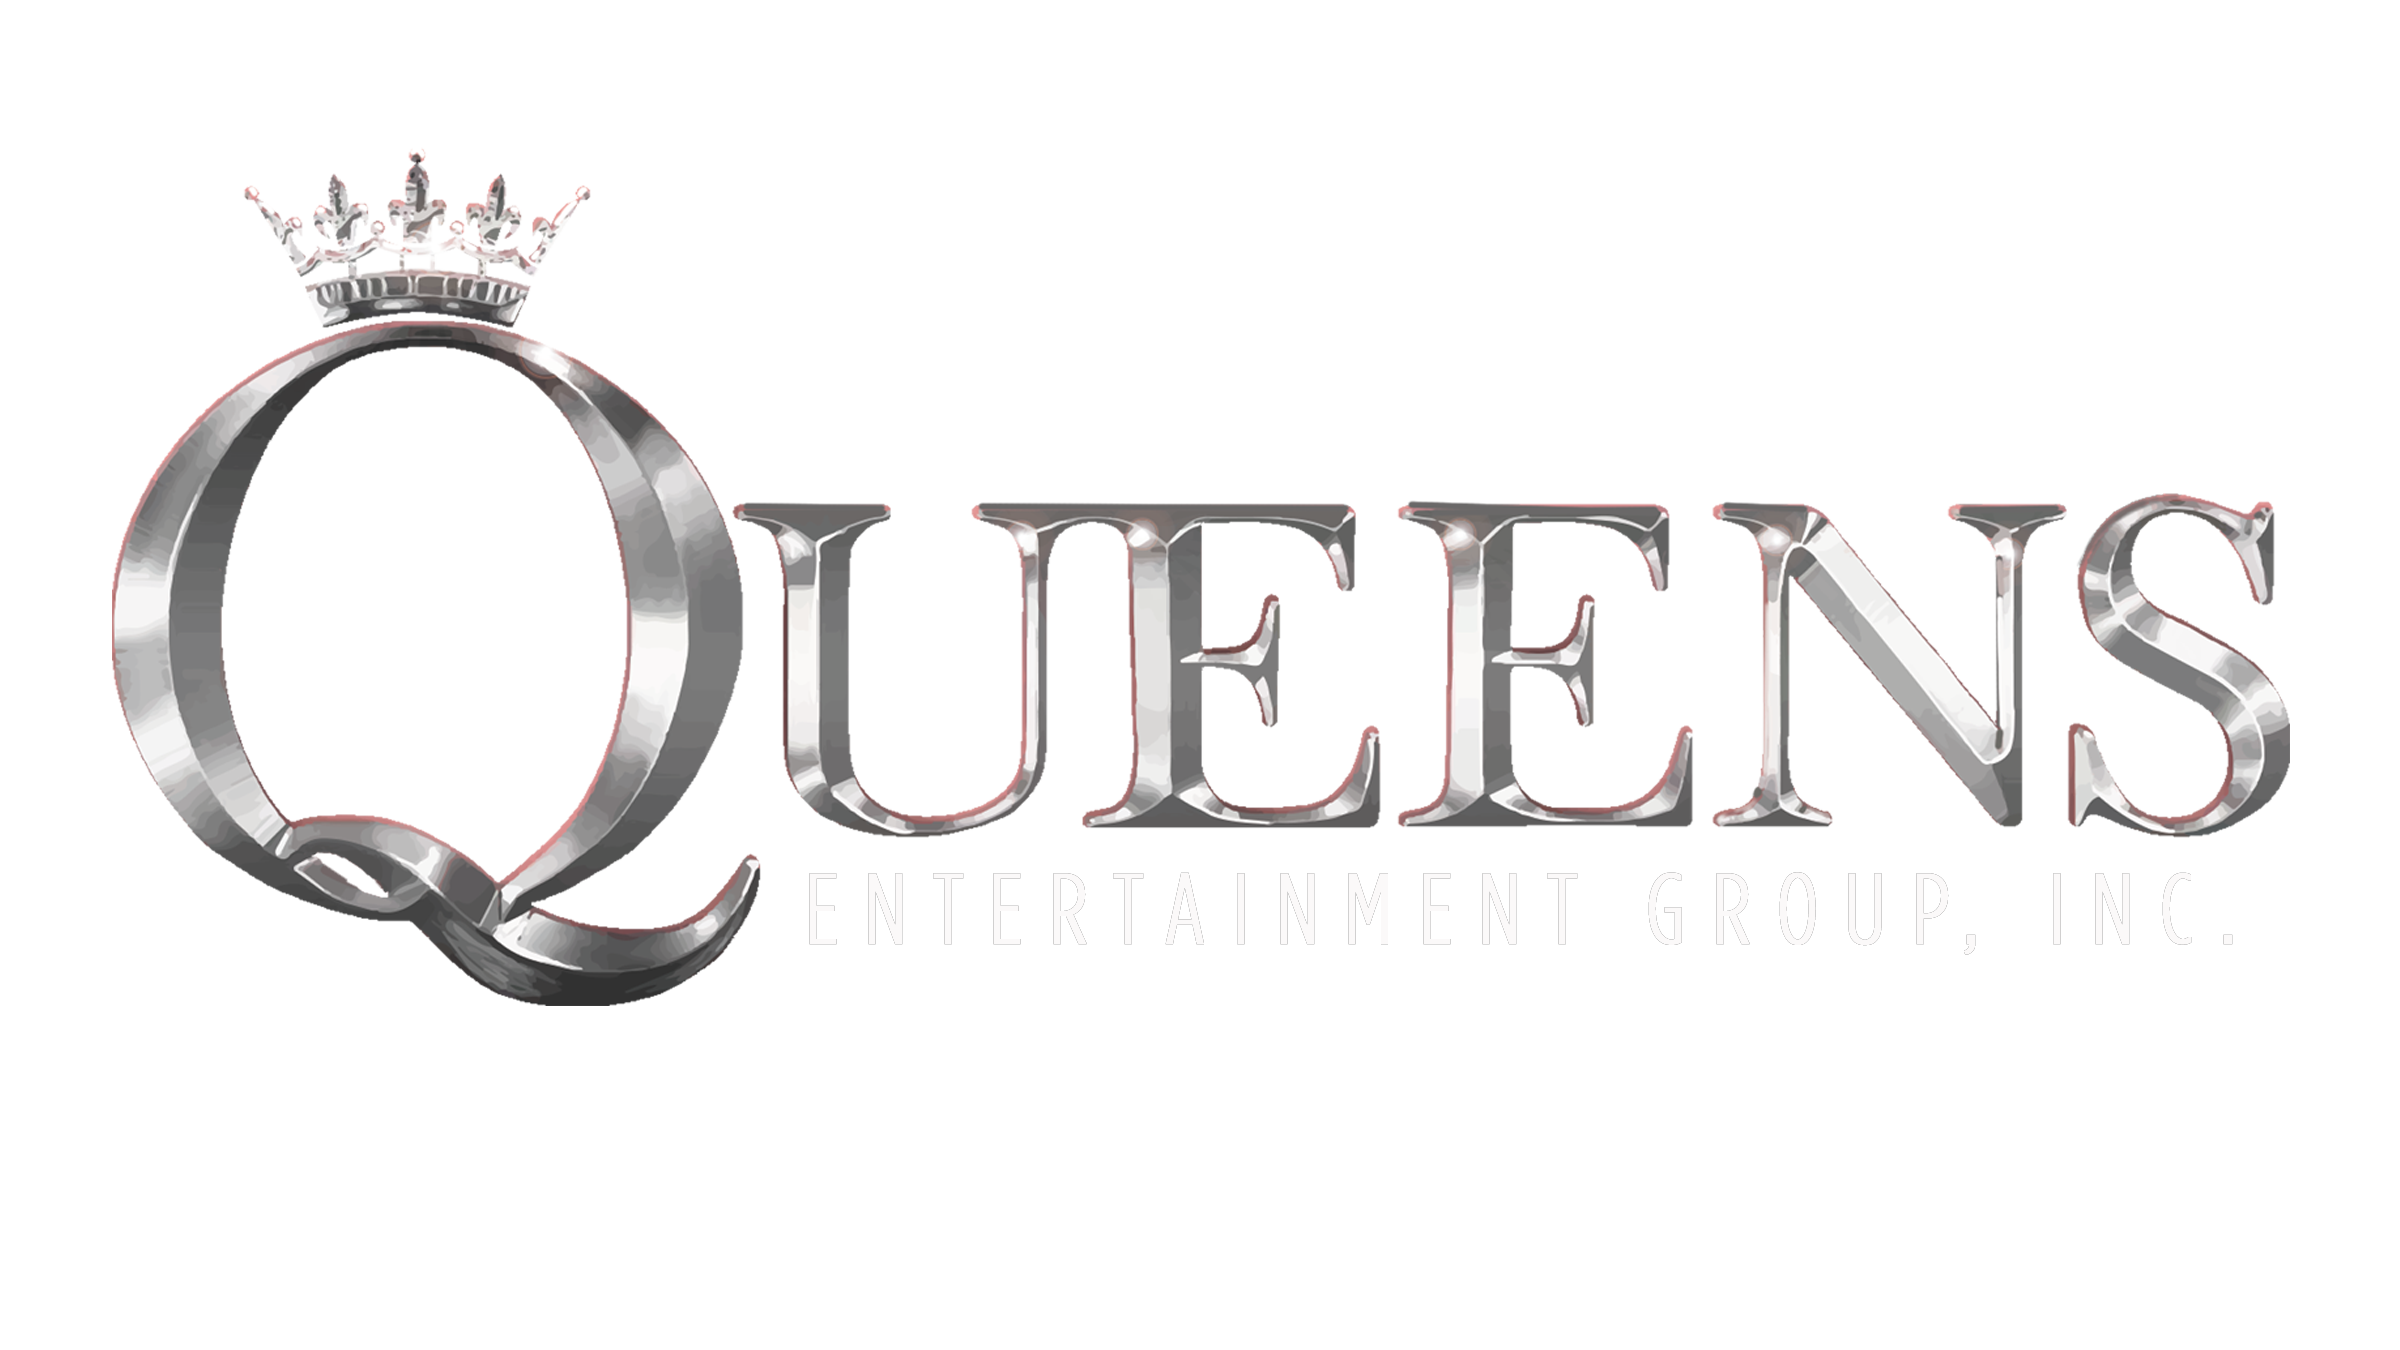 Queens Entertainment Group, Inc.